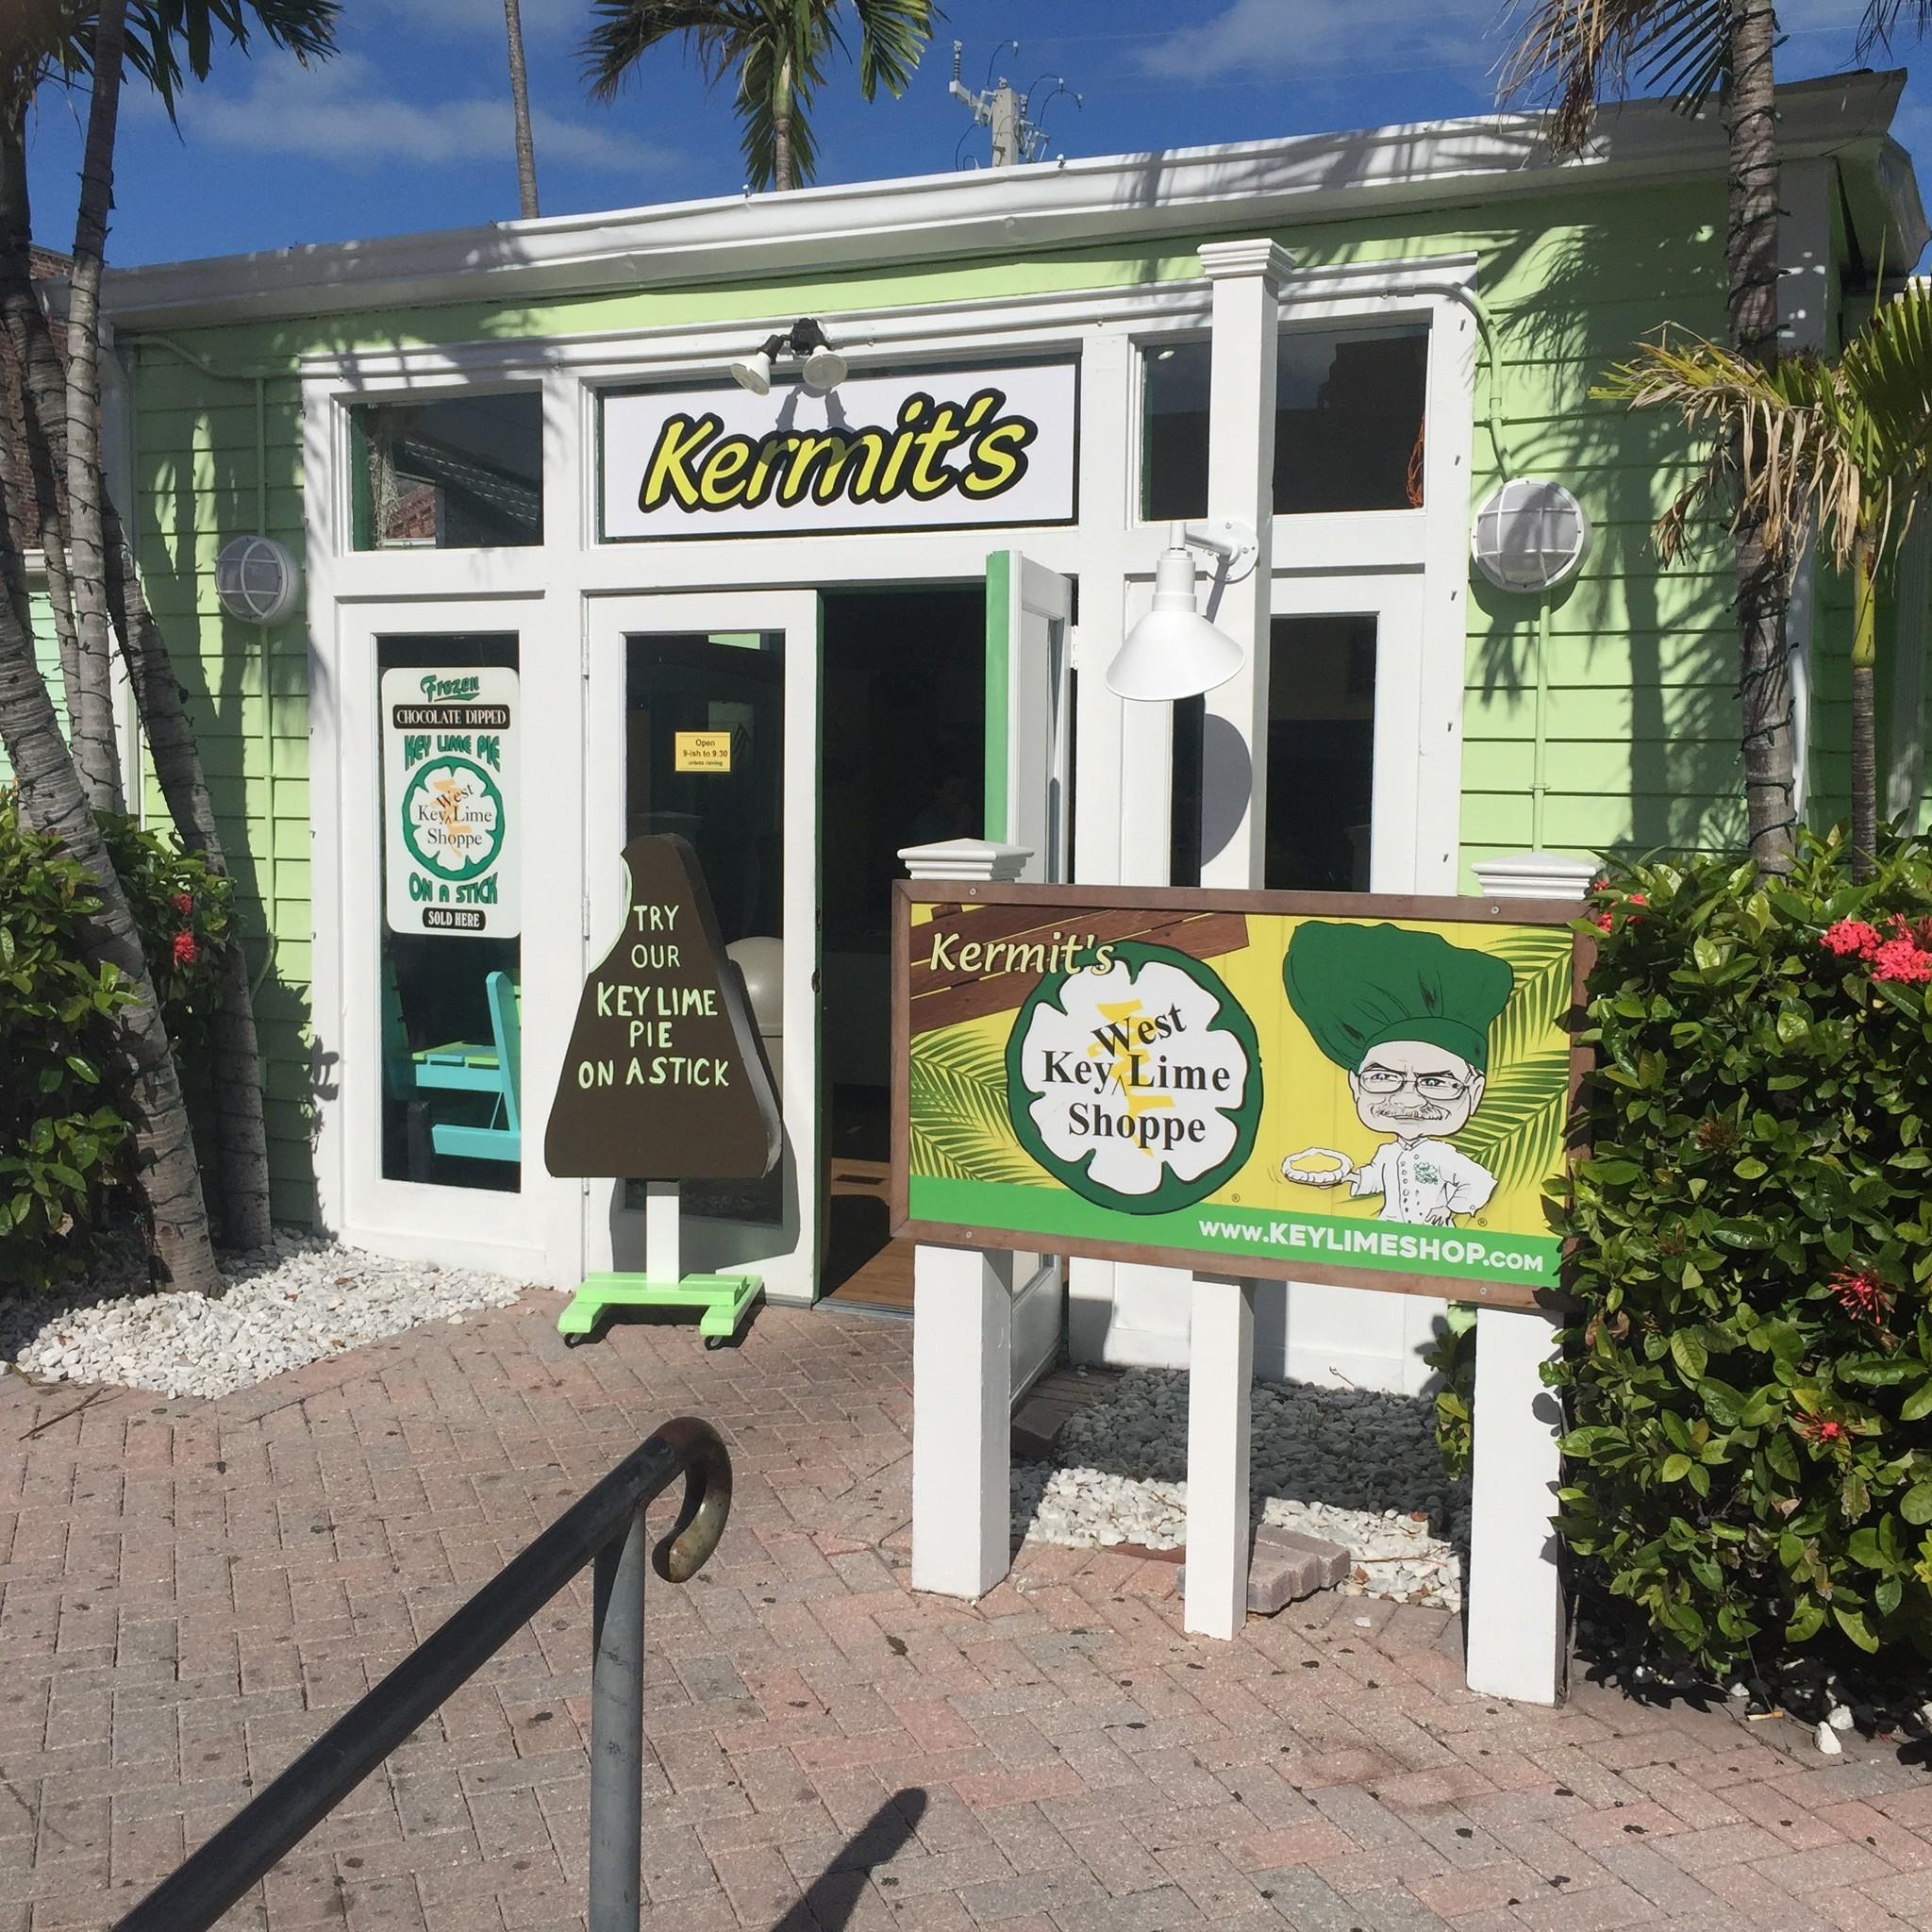 Kermit's Front Street Location